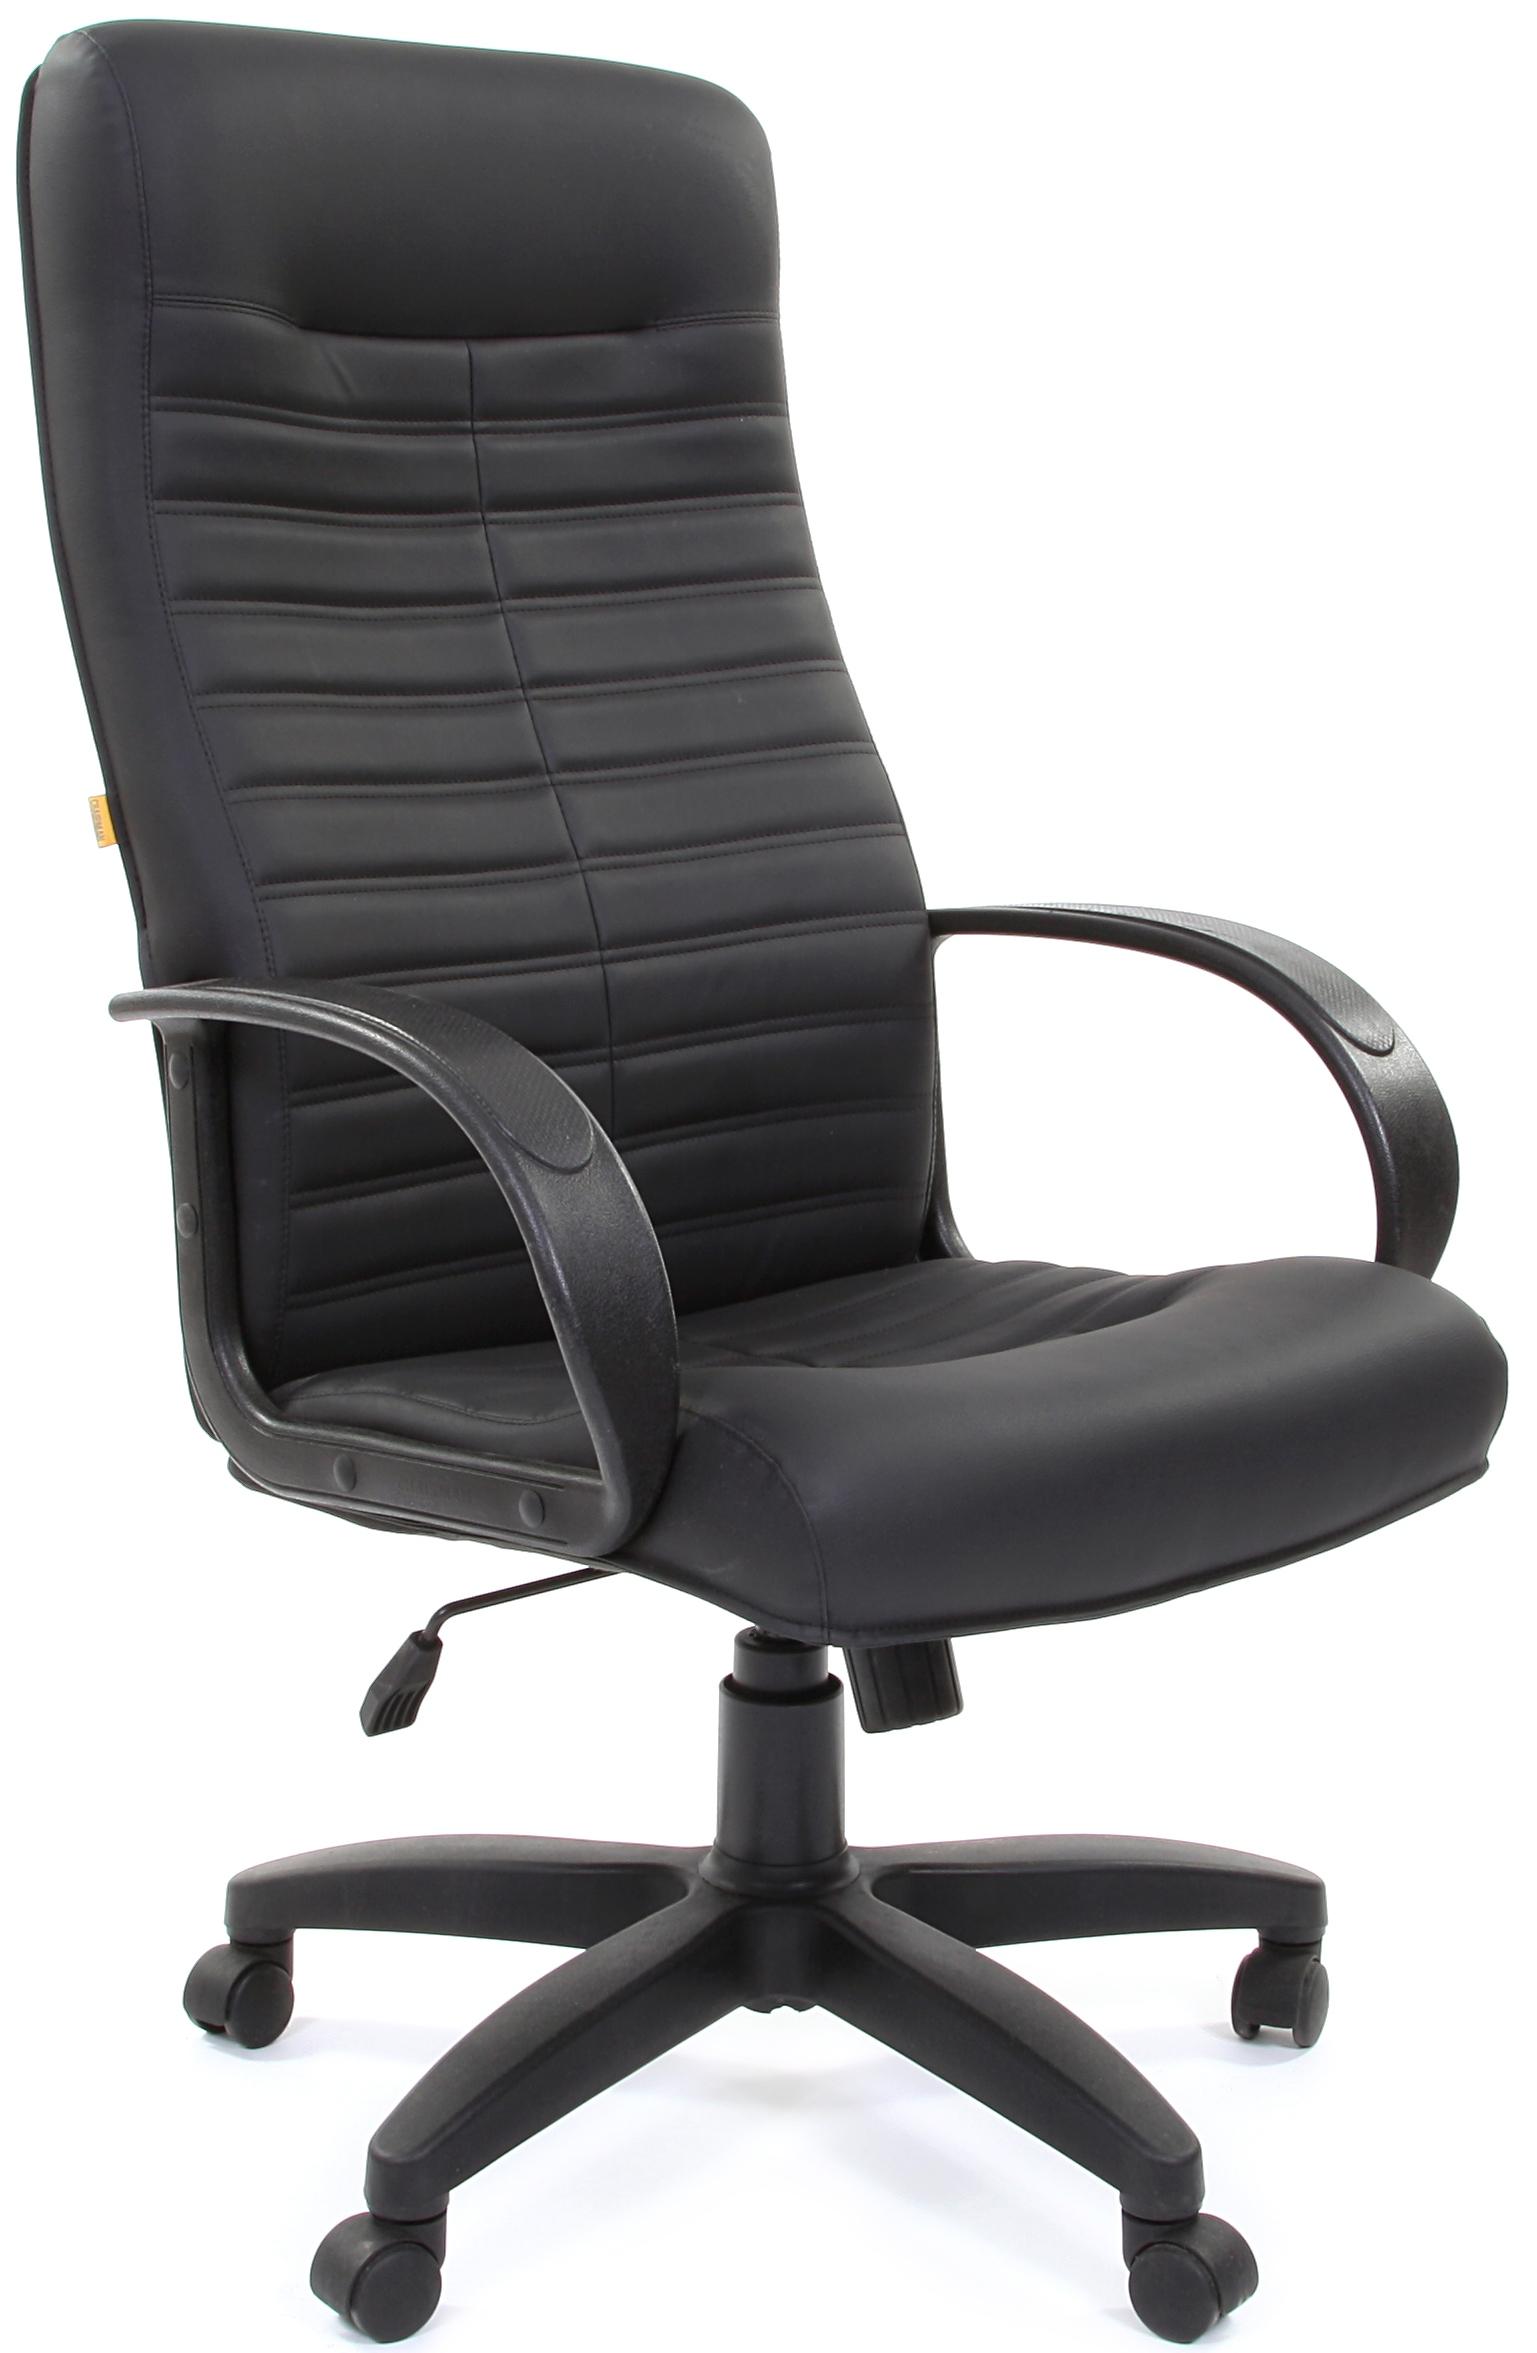 Кресло руководителя CH-480 LT экокожа черная, Chairman 480 LT